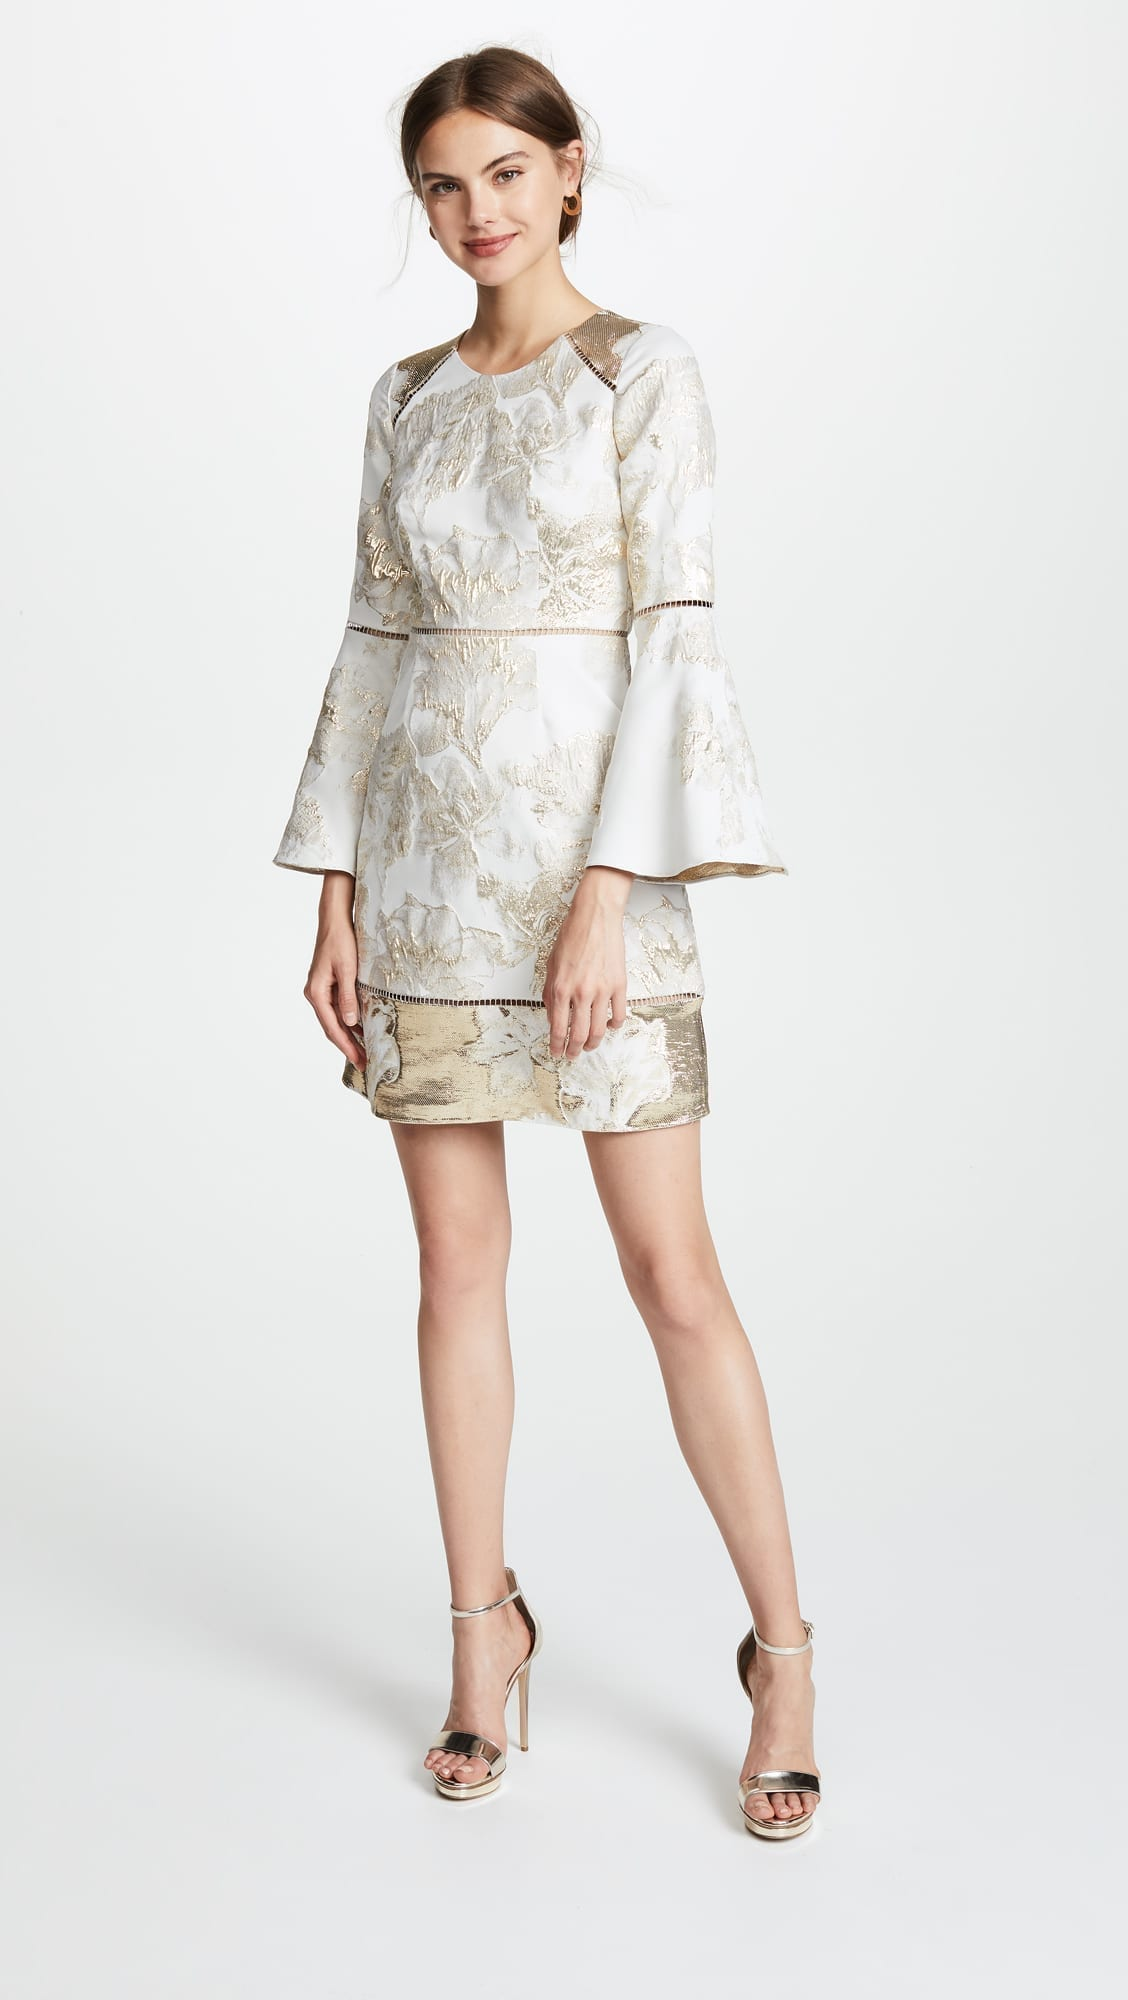 MARCHESA NOTTE Brocade Cocktail Ivory Dress